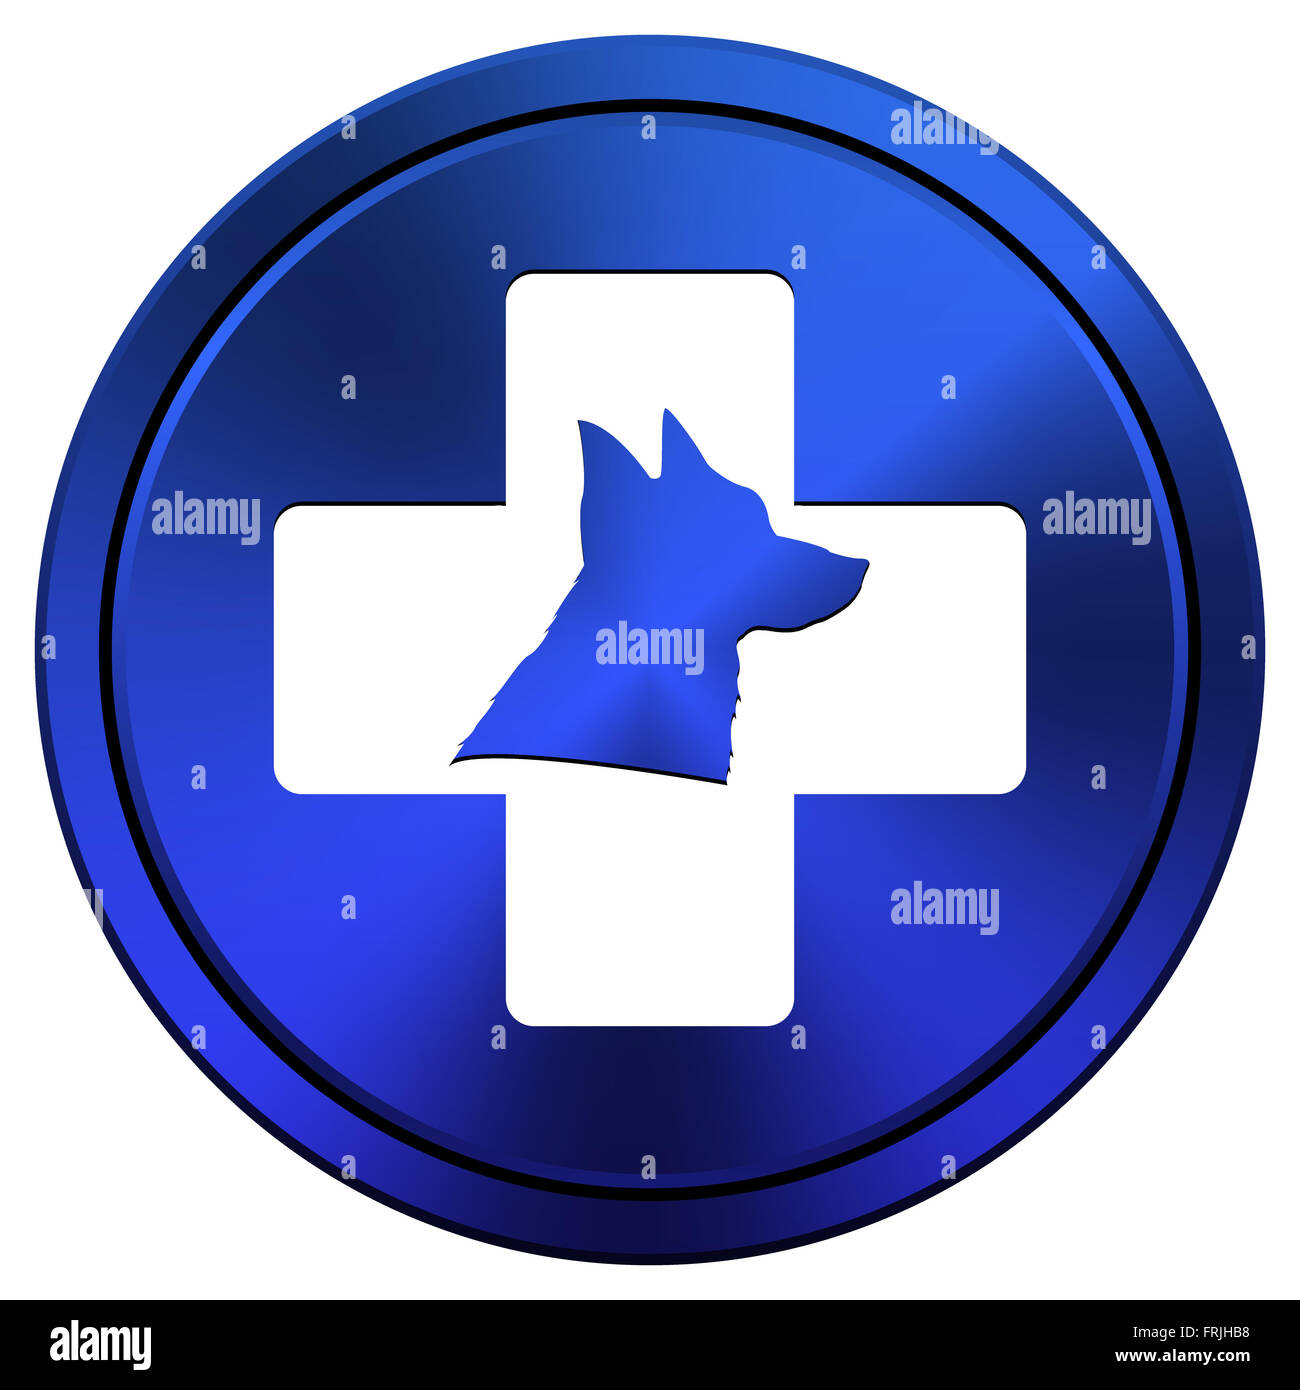 Metallic icon with white design on blue background - Stock Image